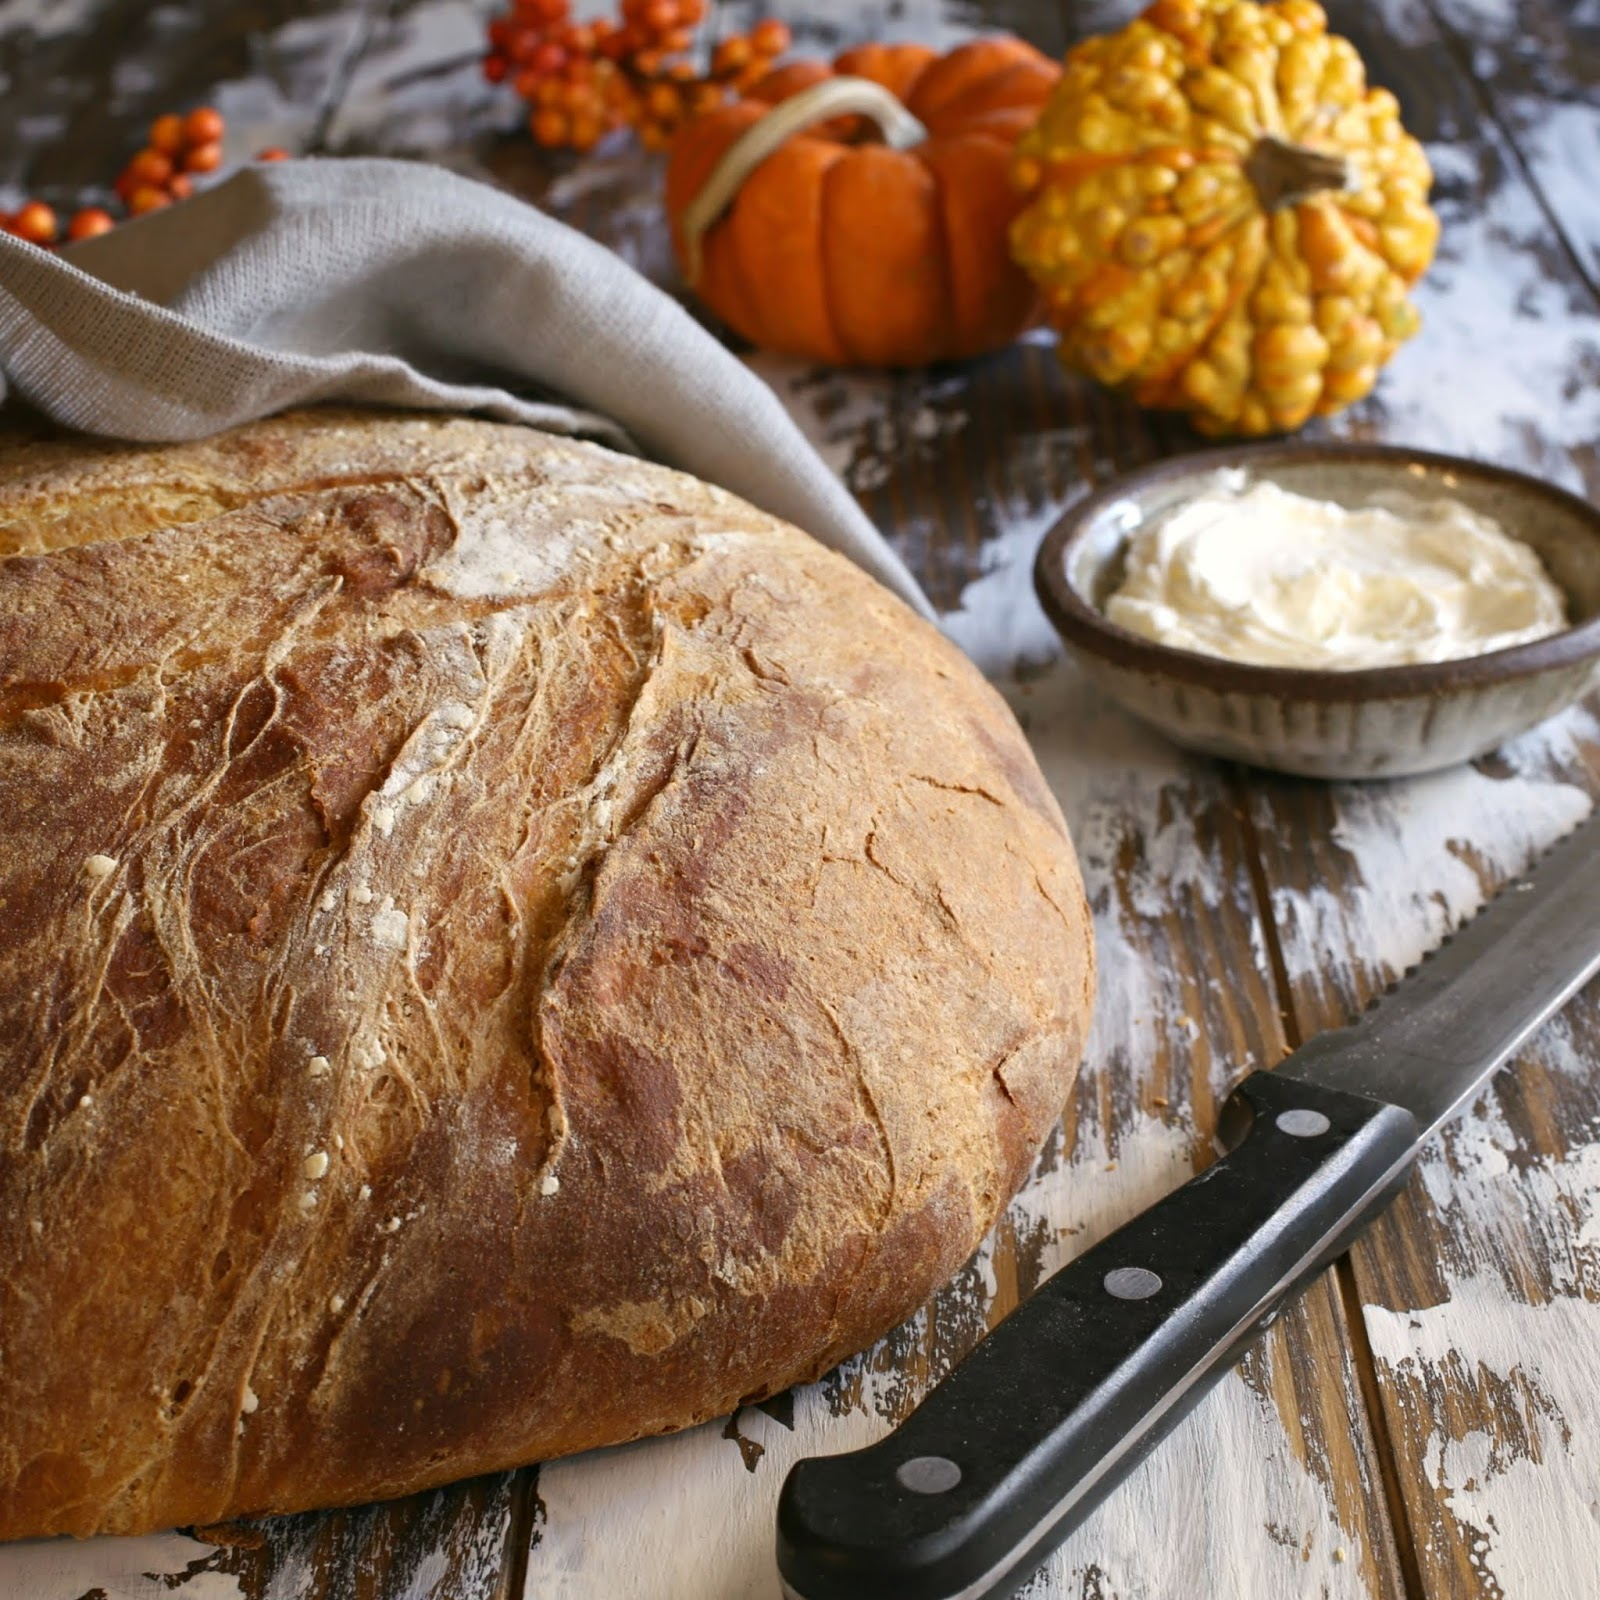 Savory crusty pumpkin bread with a light egg bread texture.